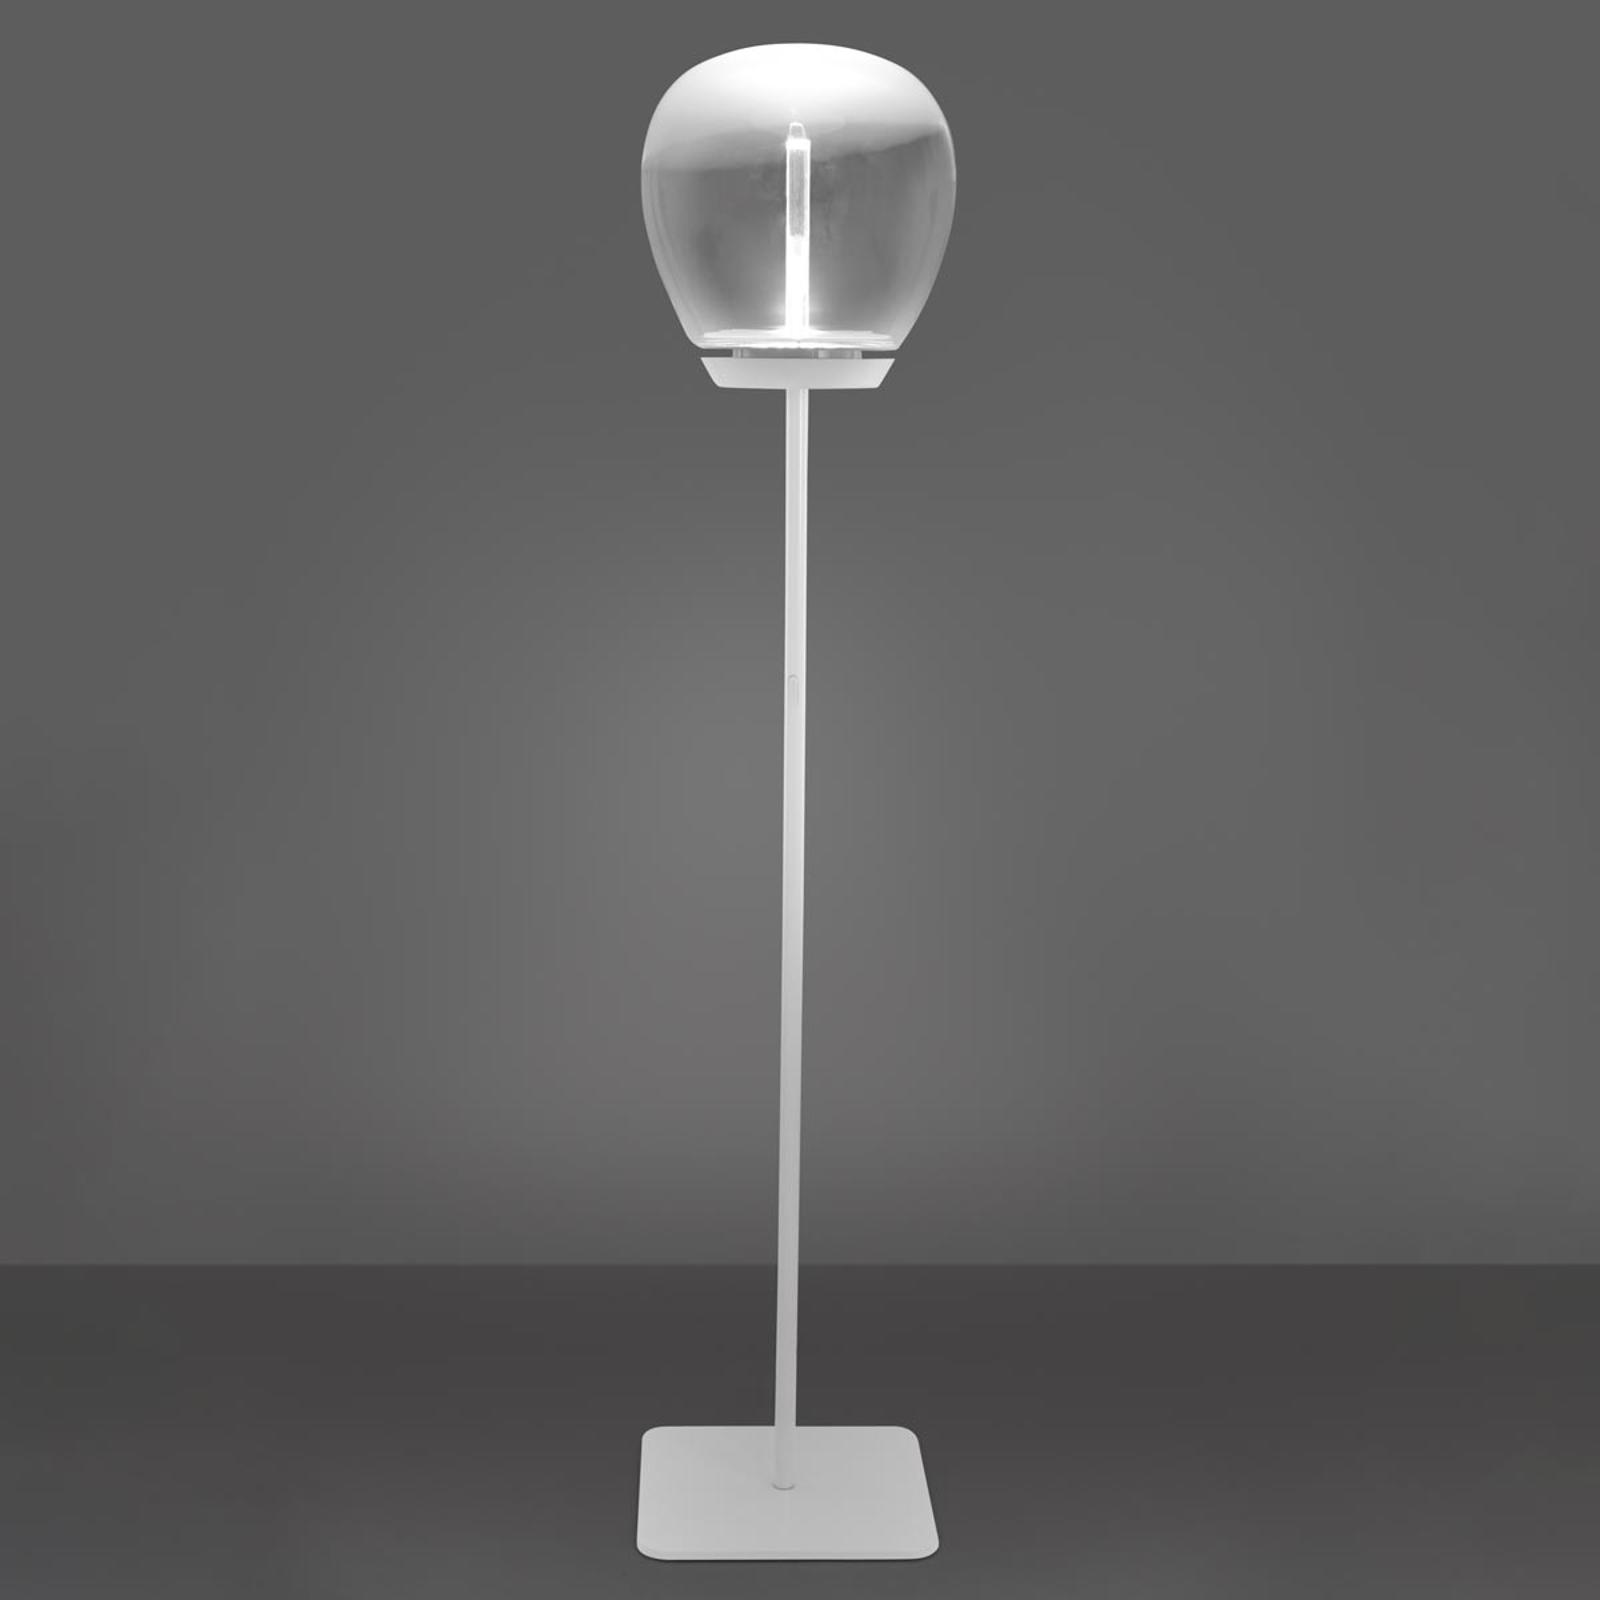 Artemide Empatia - Designer-Stehleuchte mit LED